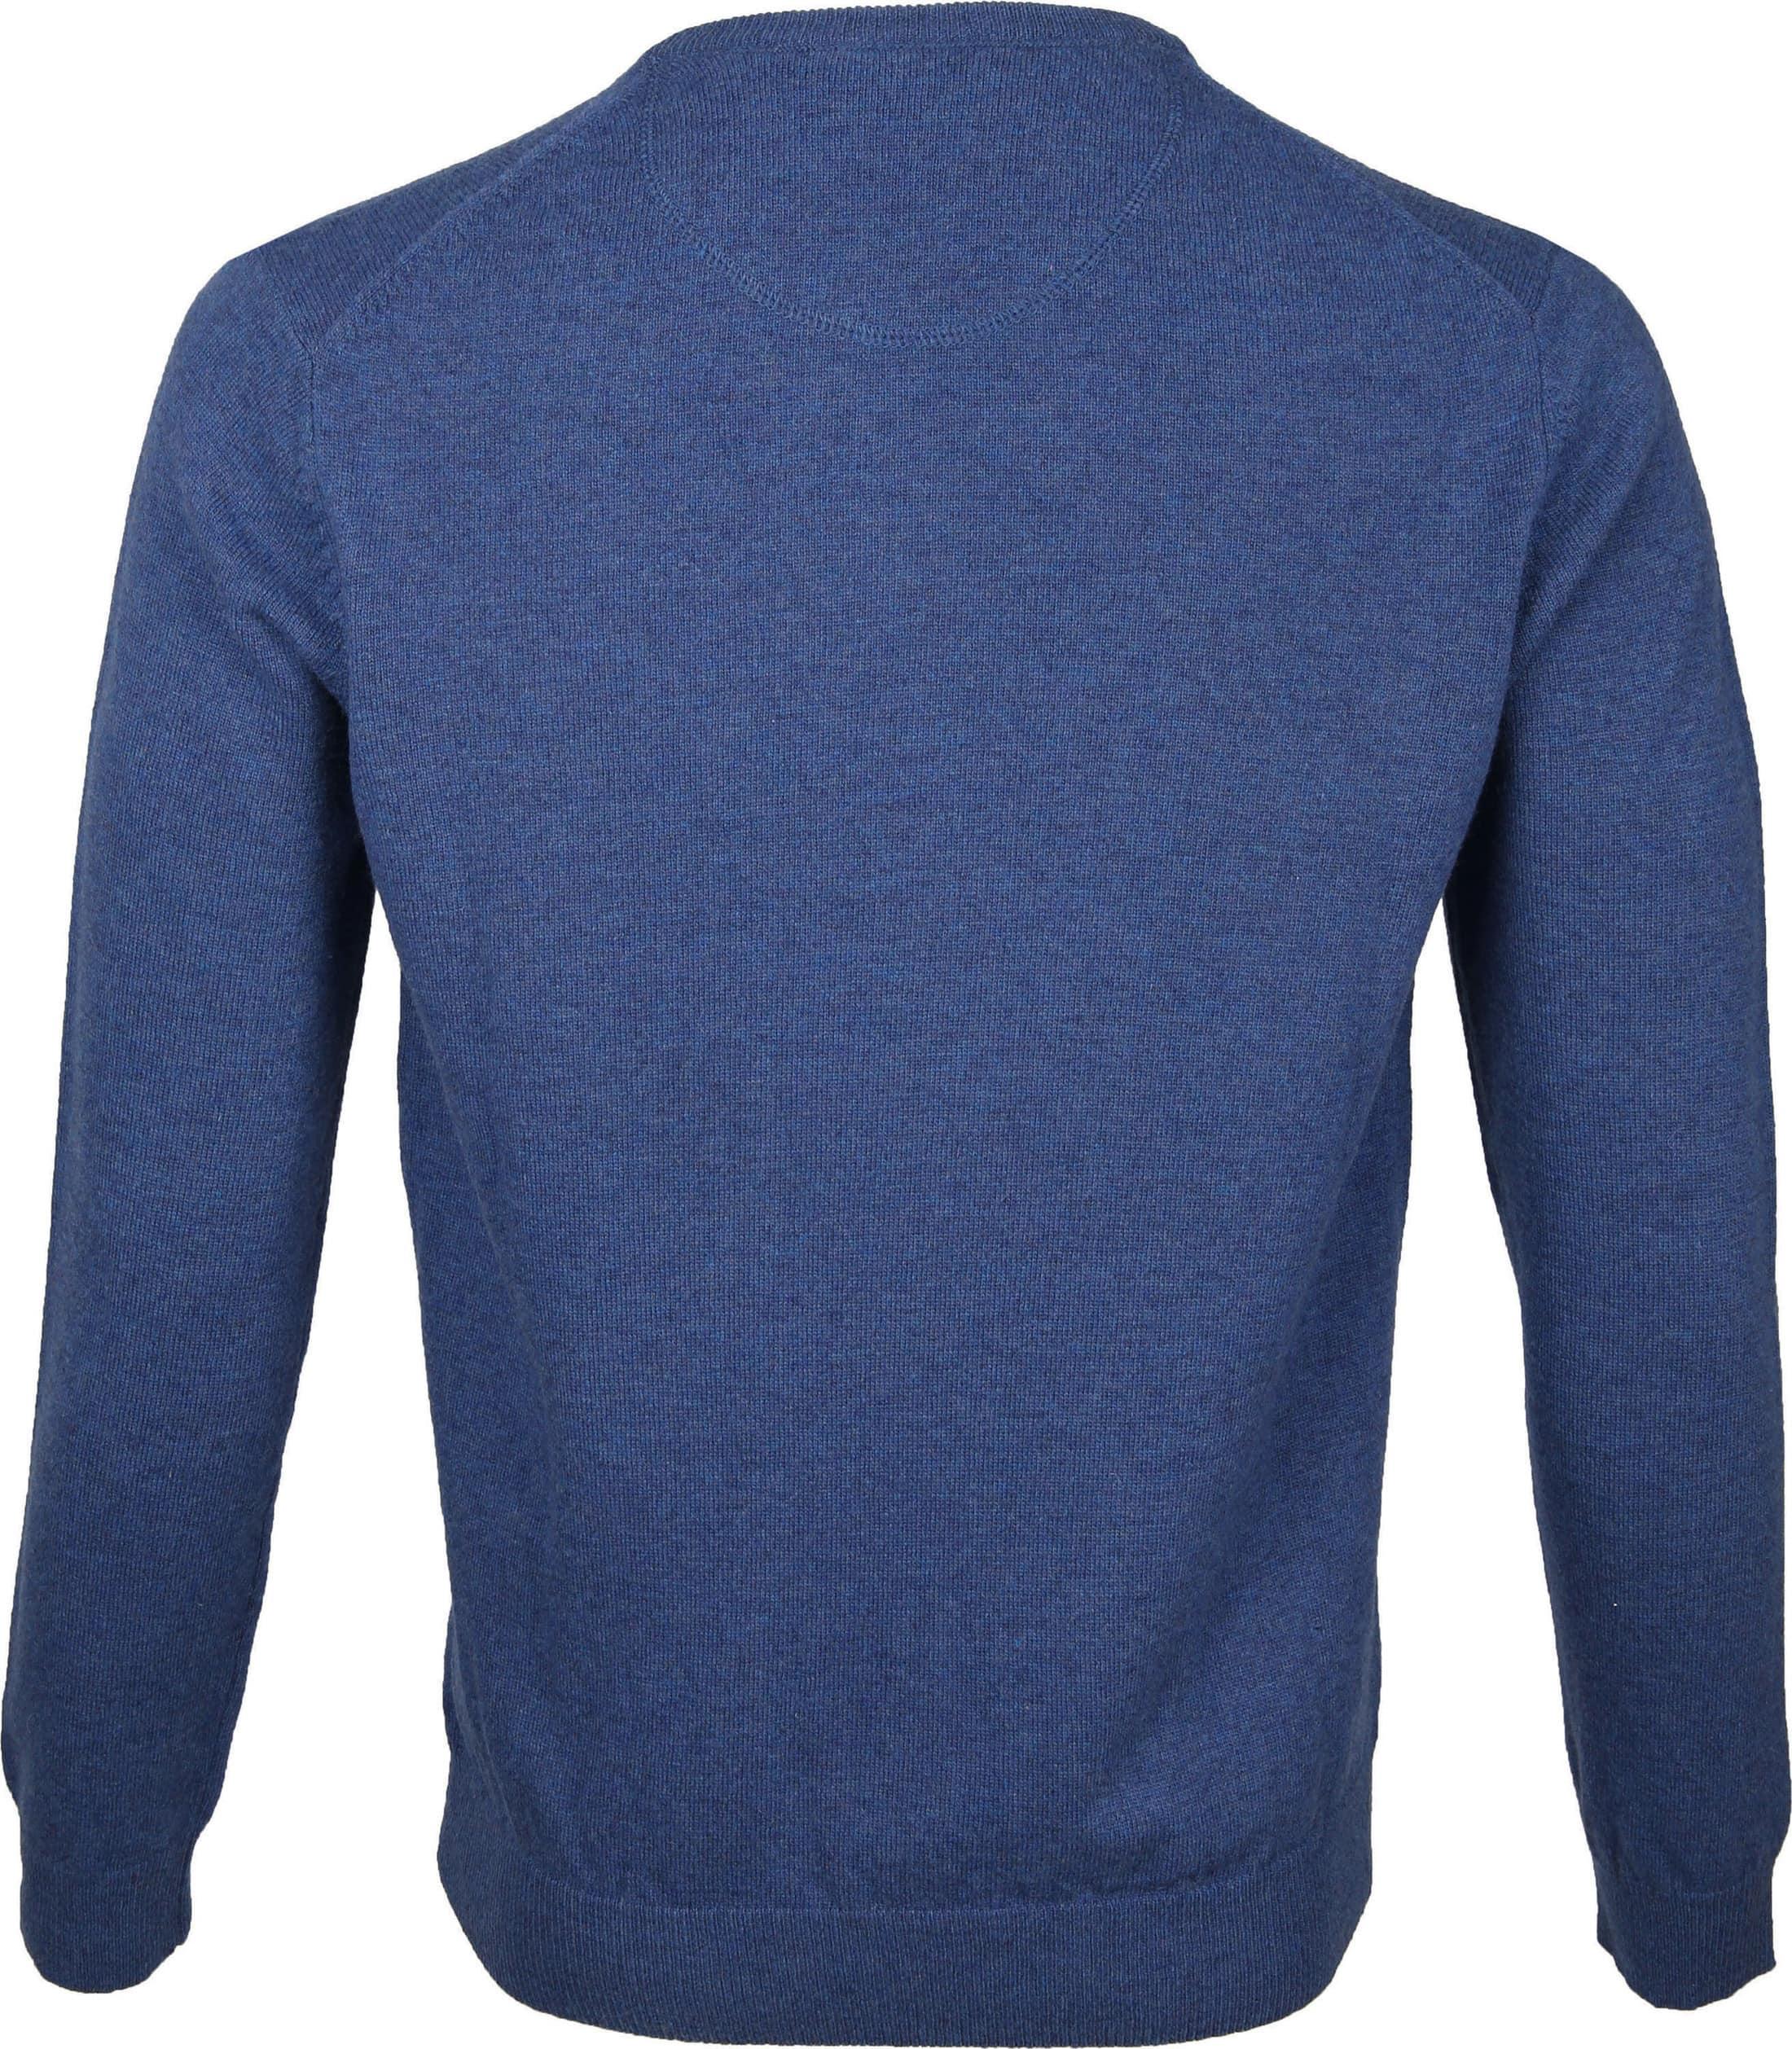 Suitable Pullover Lammwolle V-Ausschnitt Blau foto 2